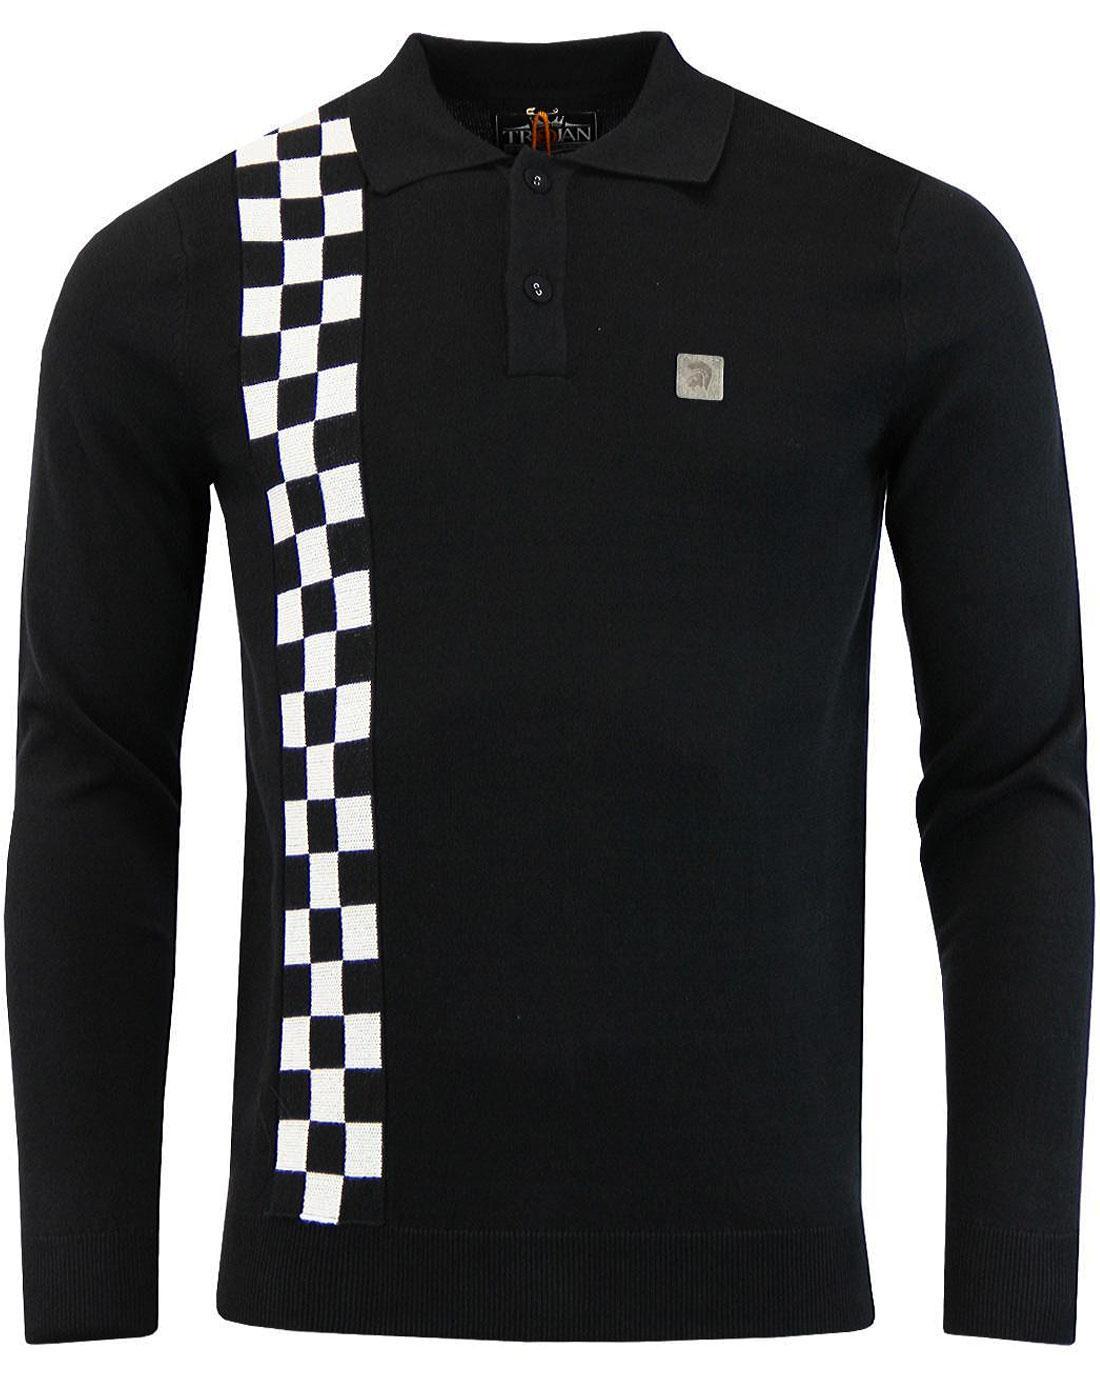 TROJAN RECORDS Mod Ska Check Knitted Polo Shirt